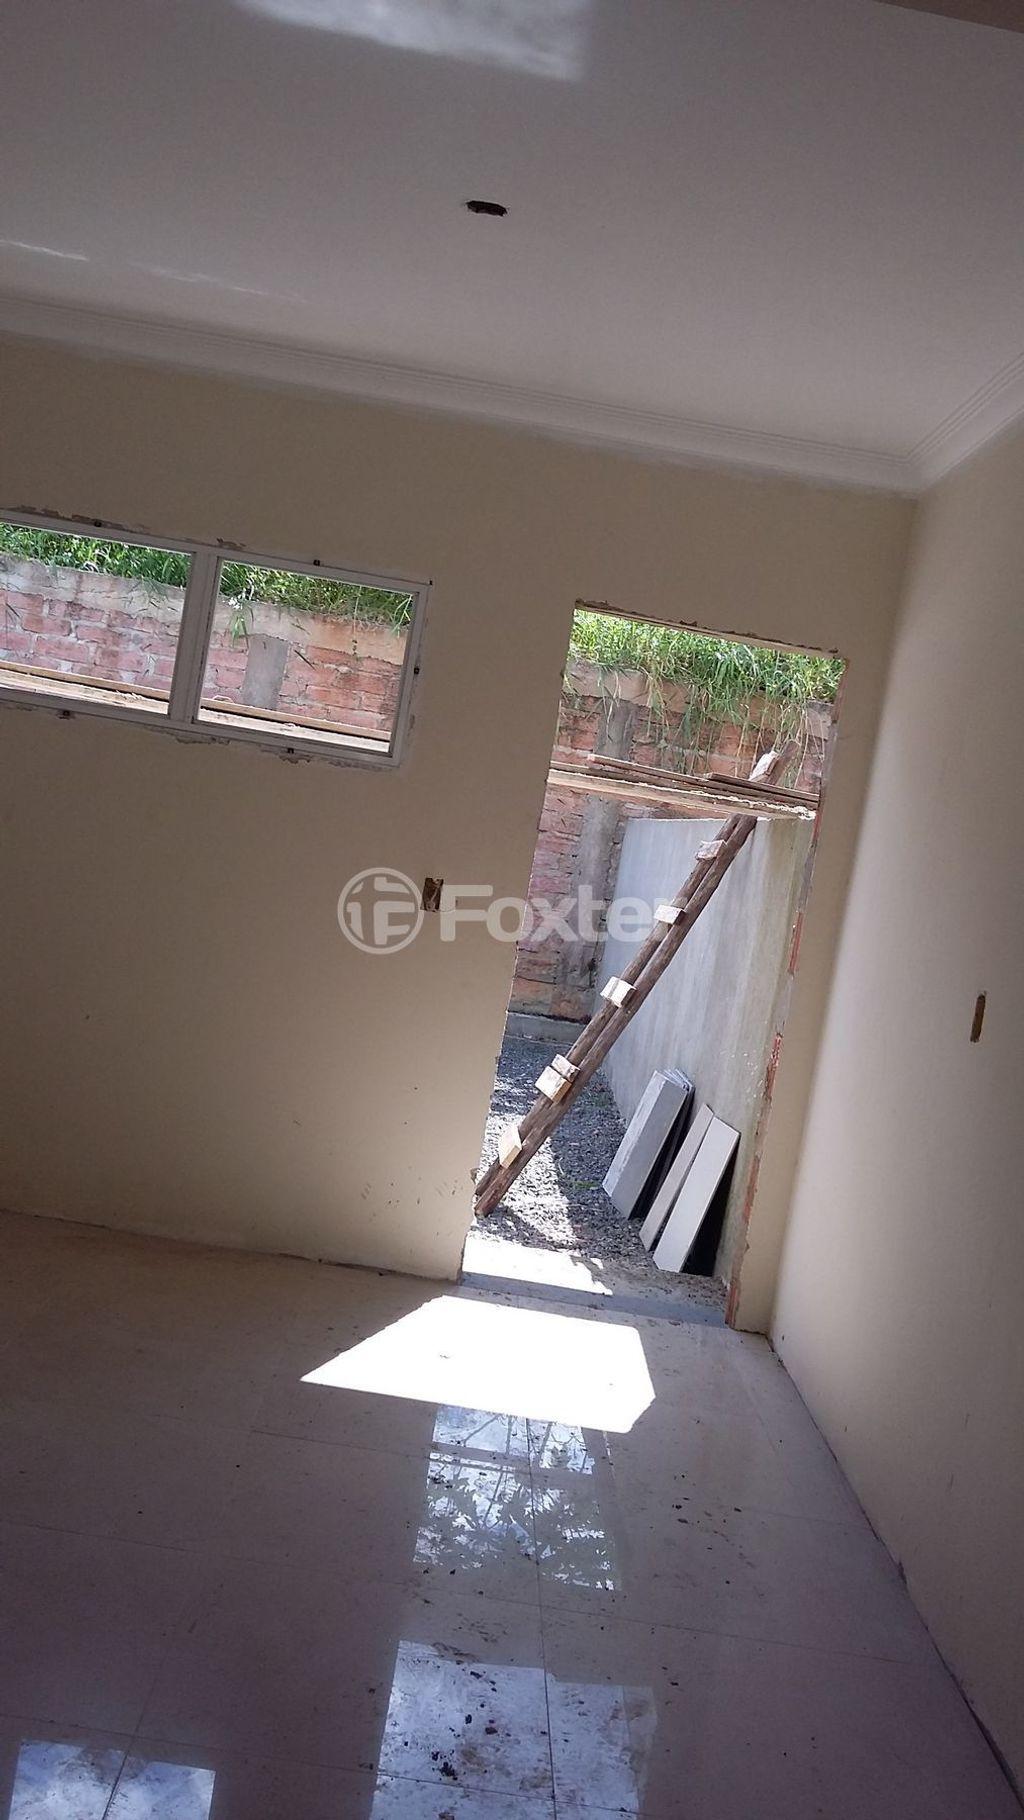 Casa 2 Dorm, Protásio Alves, Porto Alegre (136770) - Foto 7